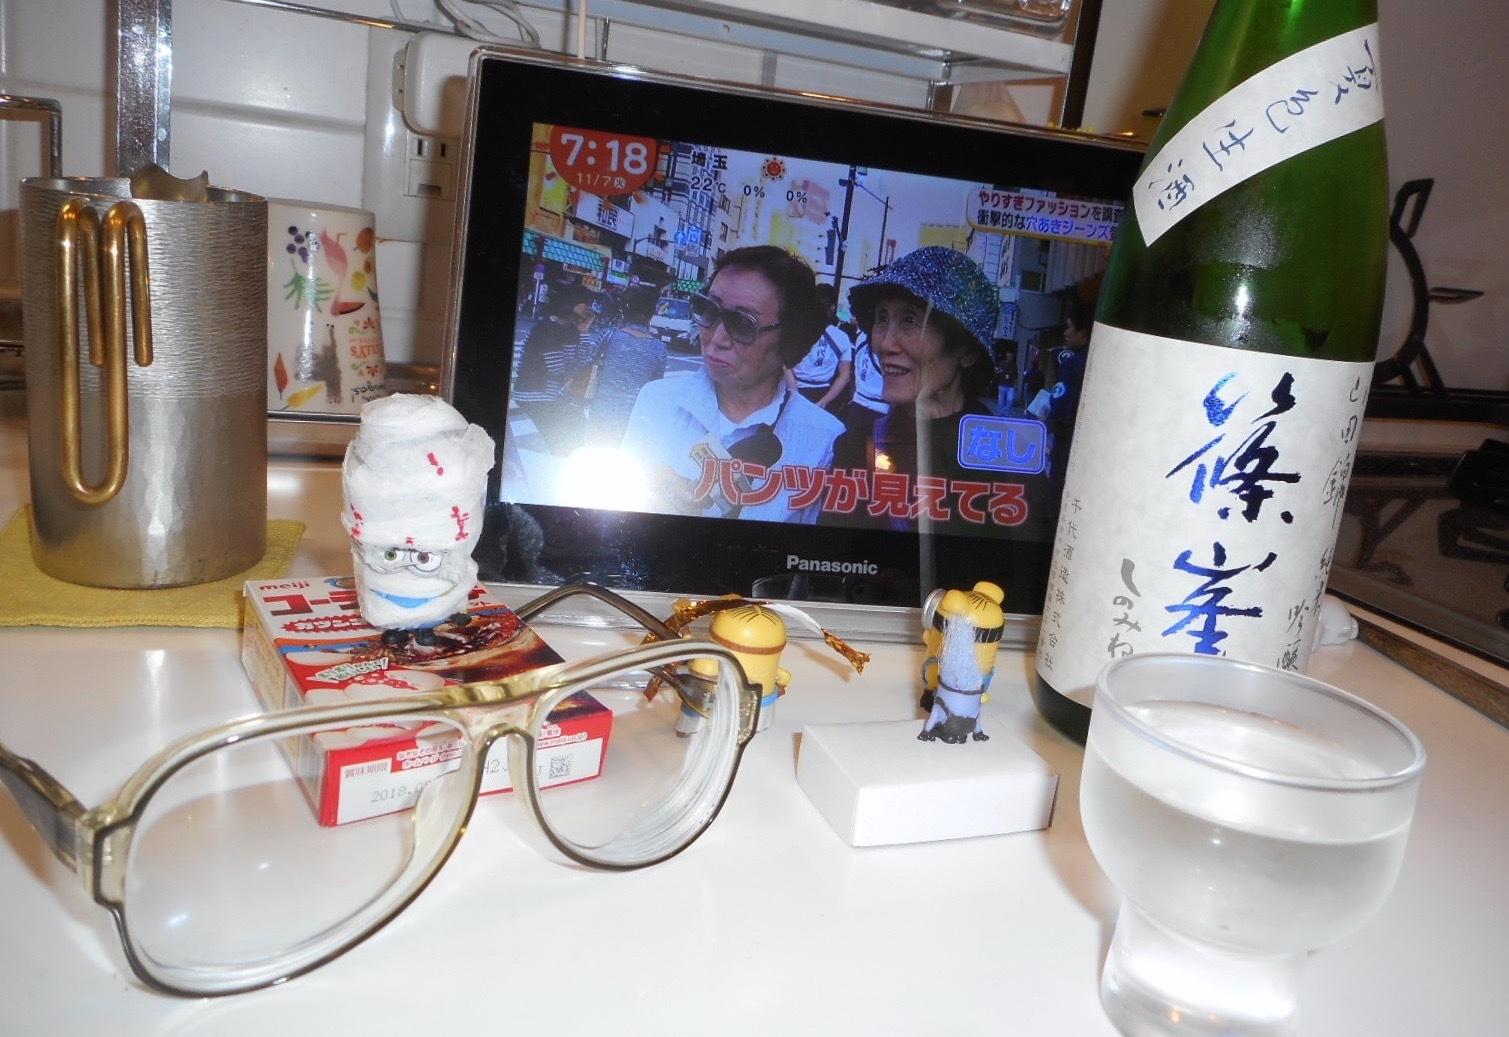 shinomine_sou_natsuiro28by11.jpg